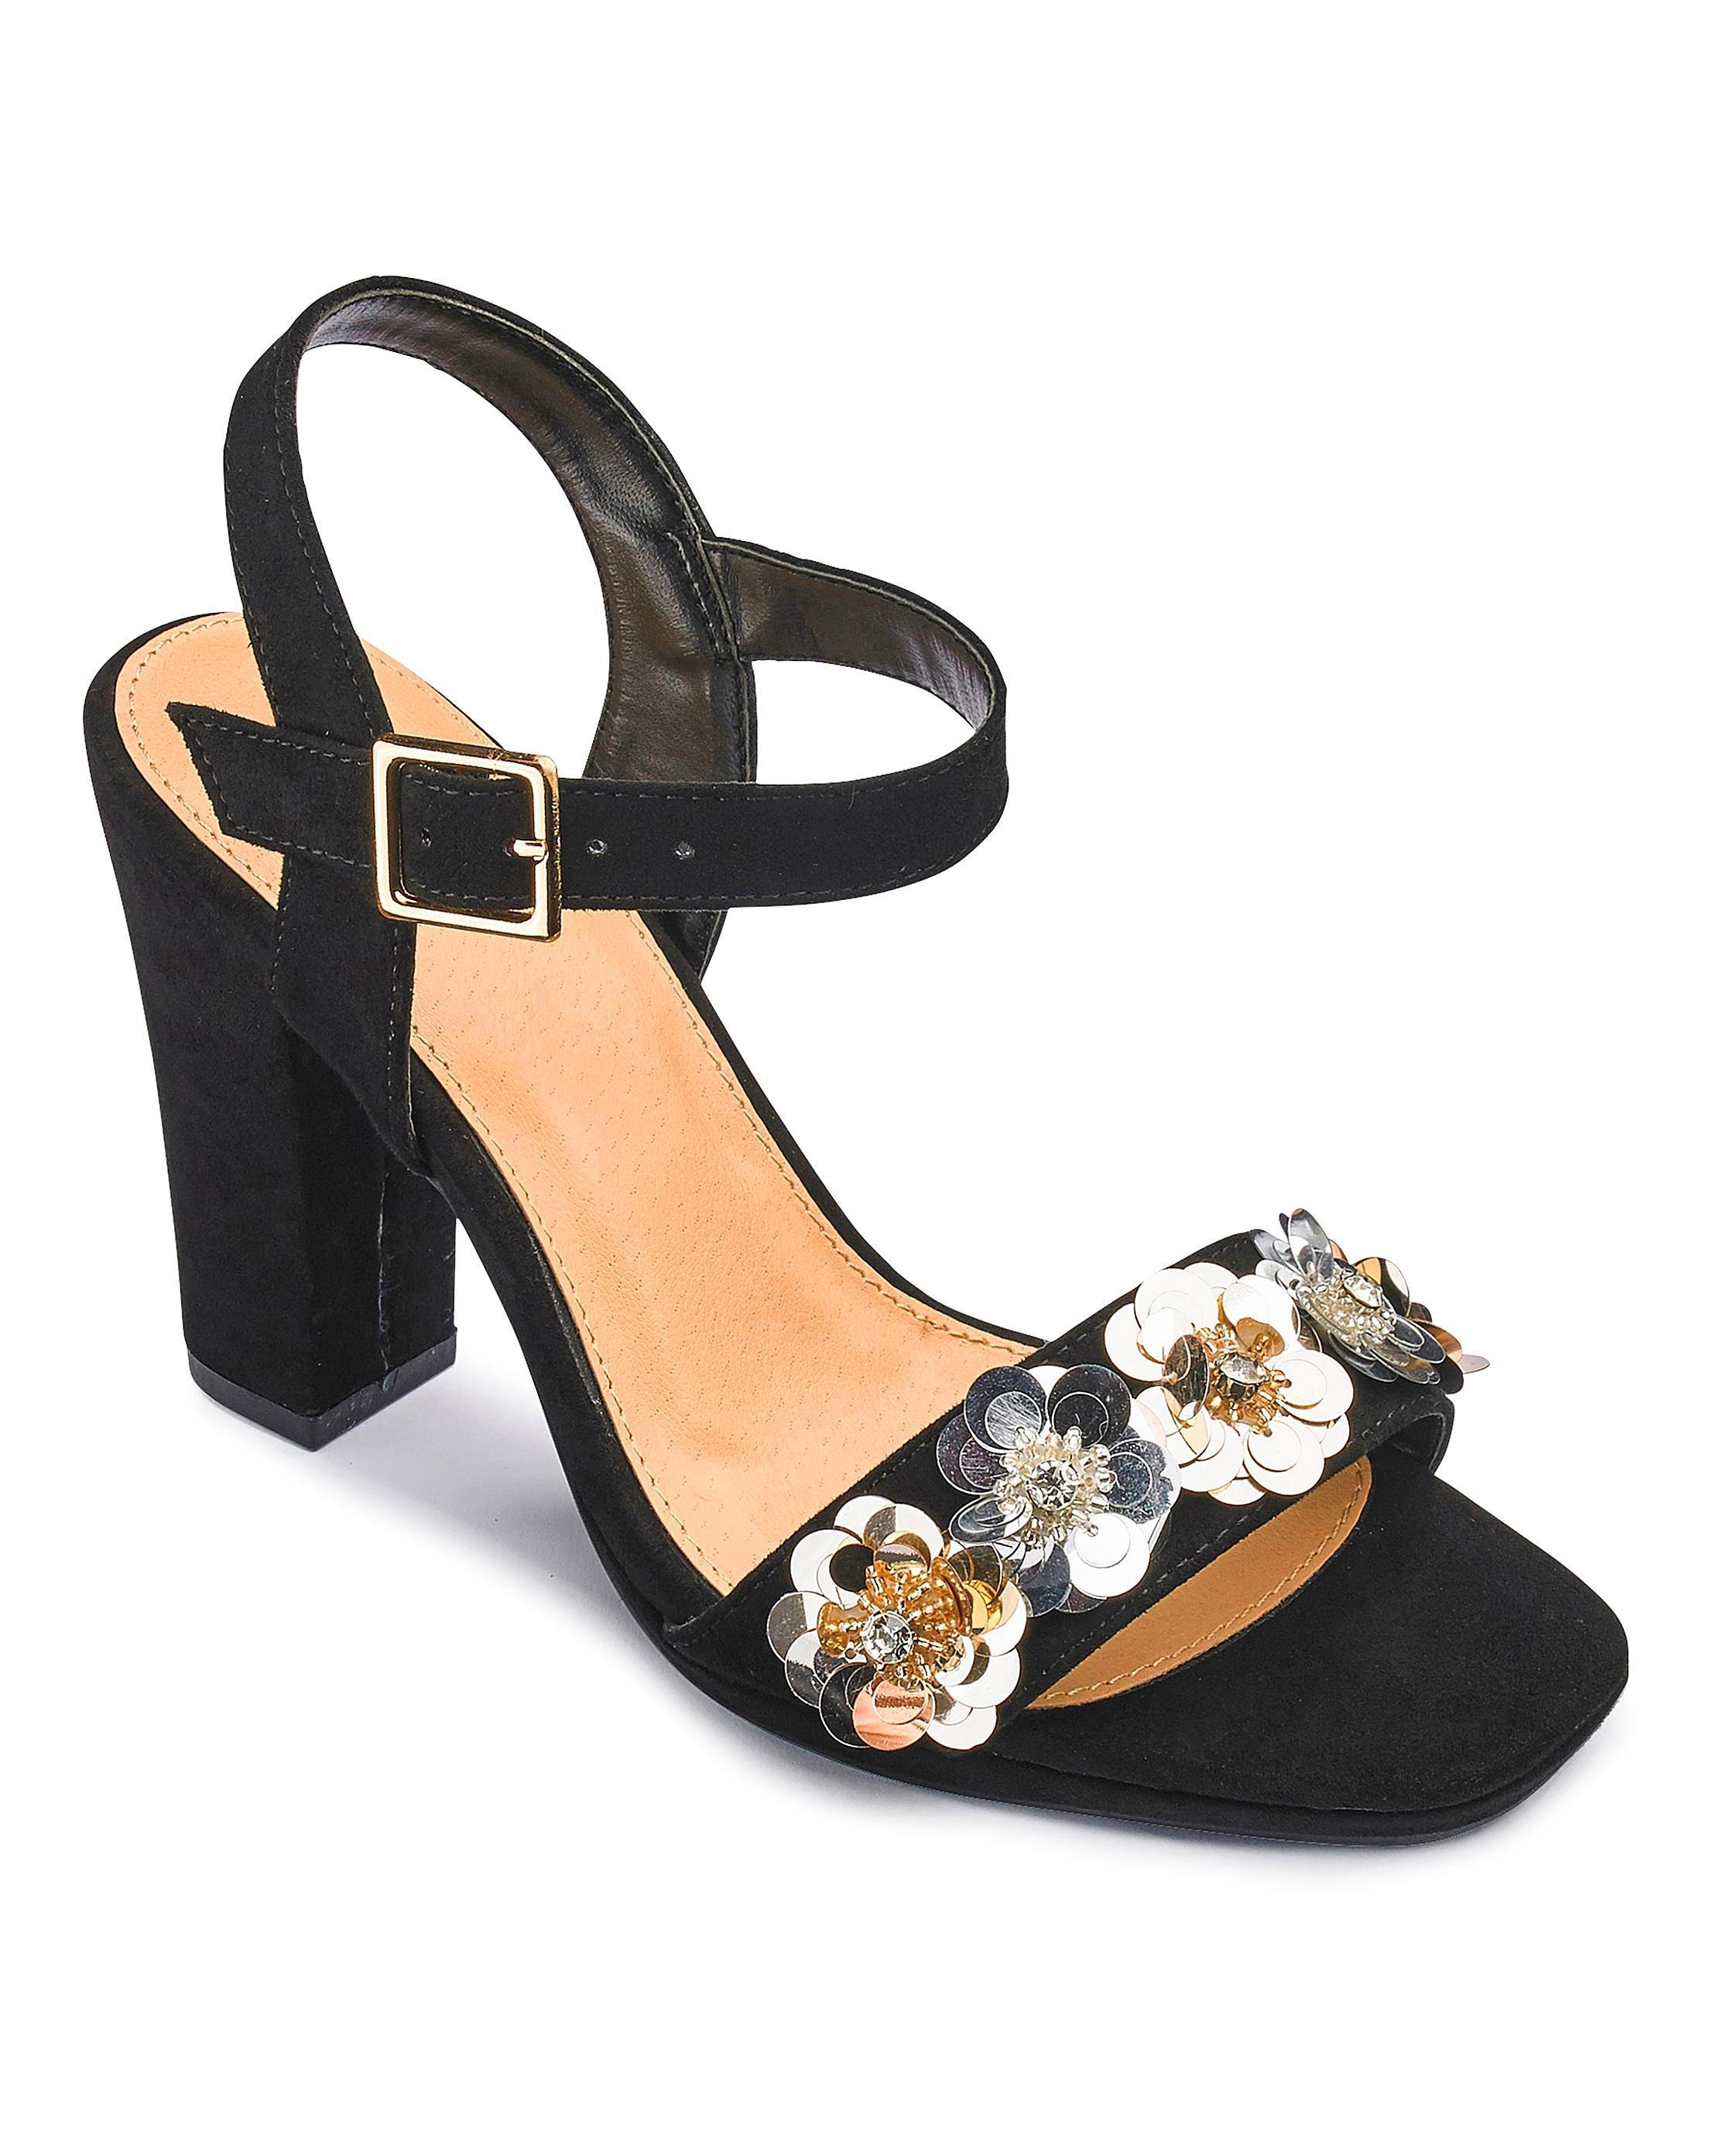 59402421b ... Sole Diva Flower Trim Heels - Lyst. View fullscreen